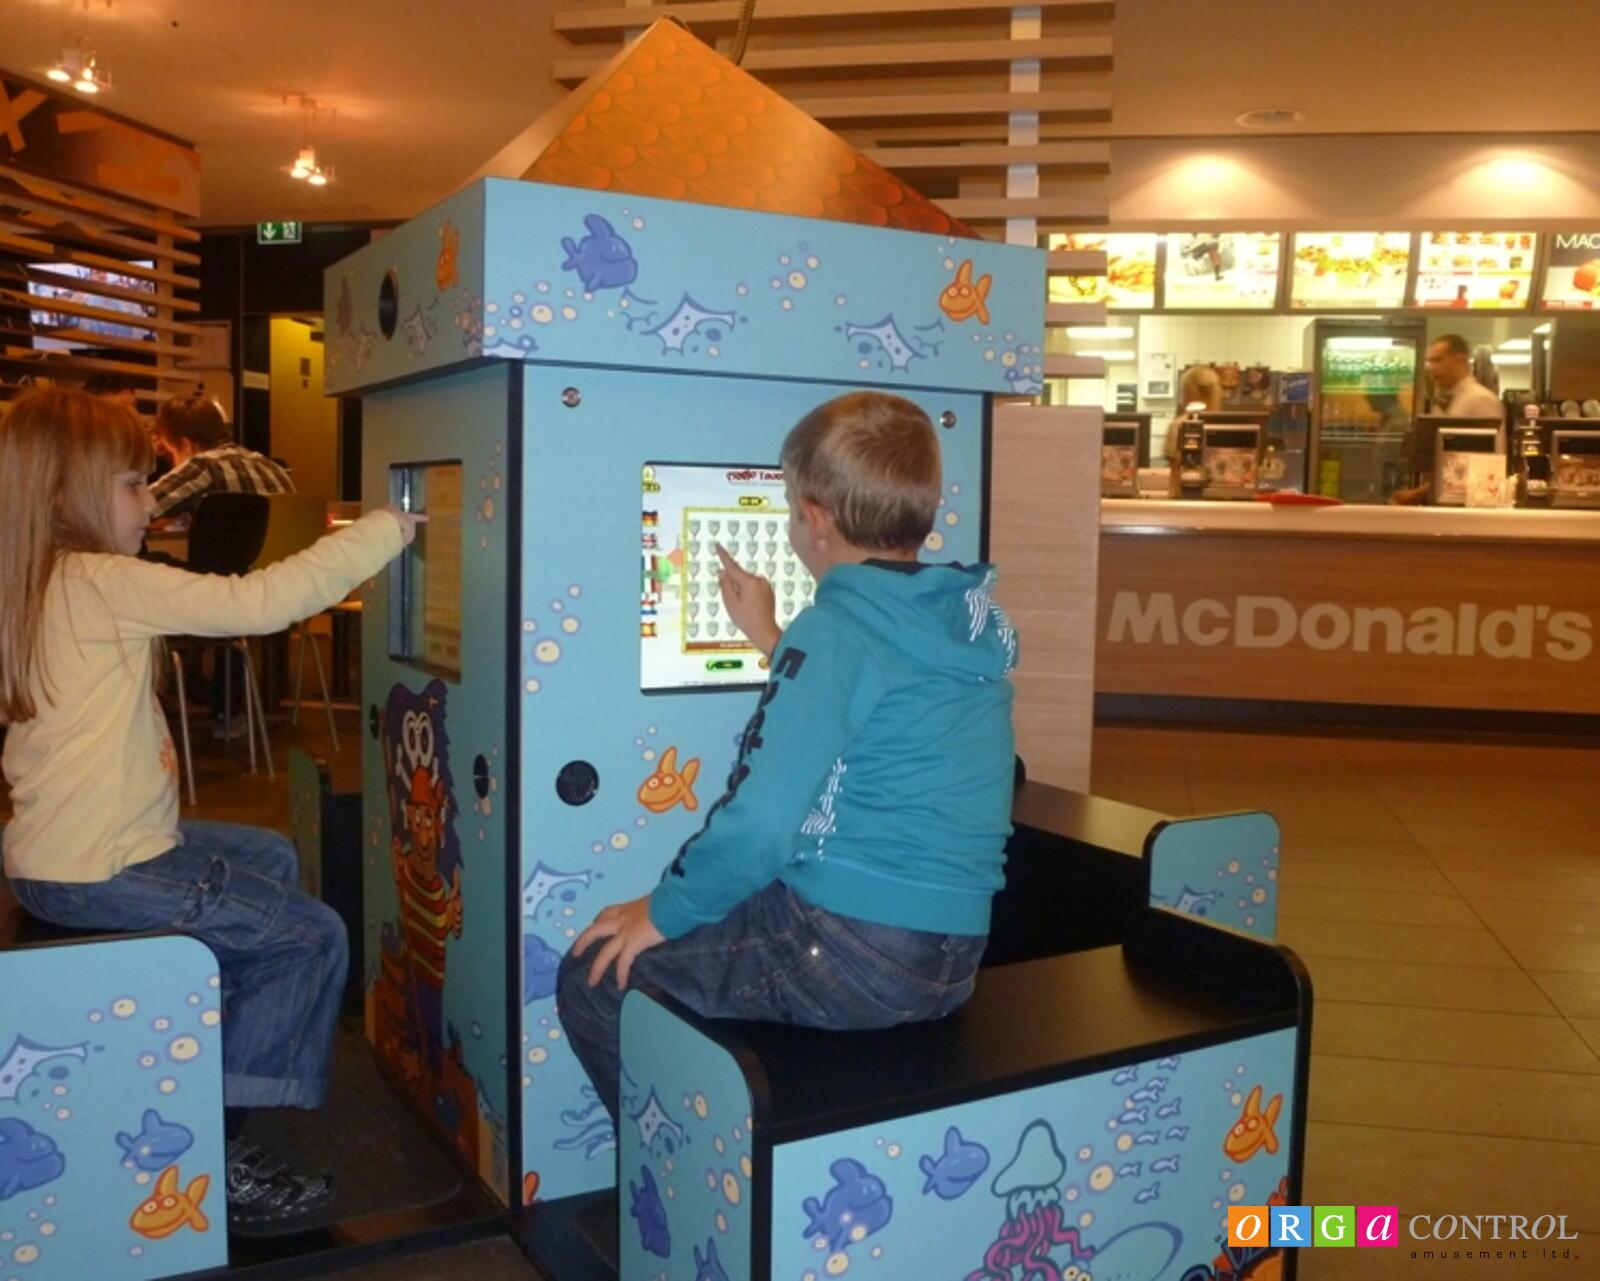 Magic Tower mit 4 Spielplätzen bei McDonald's